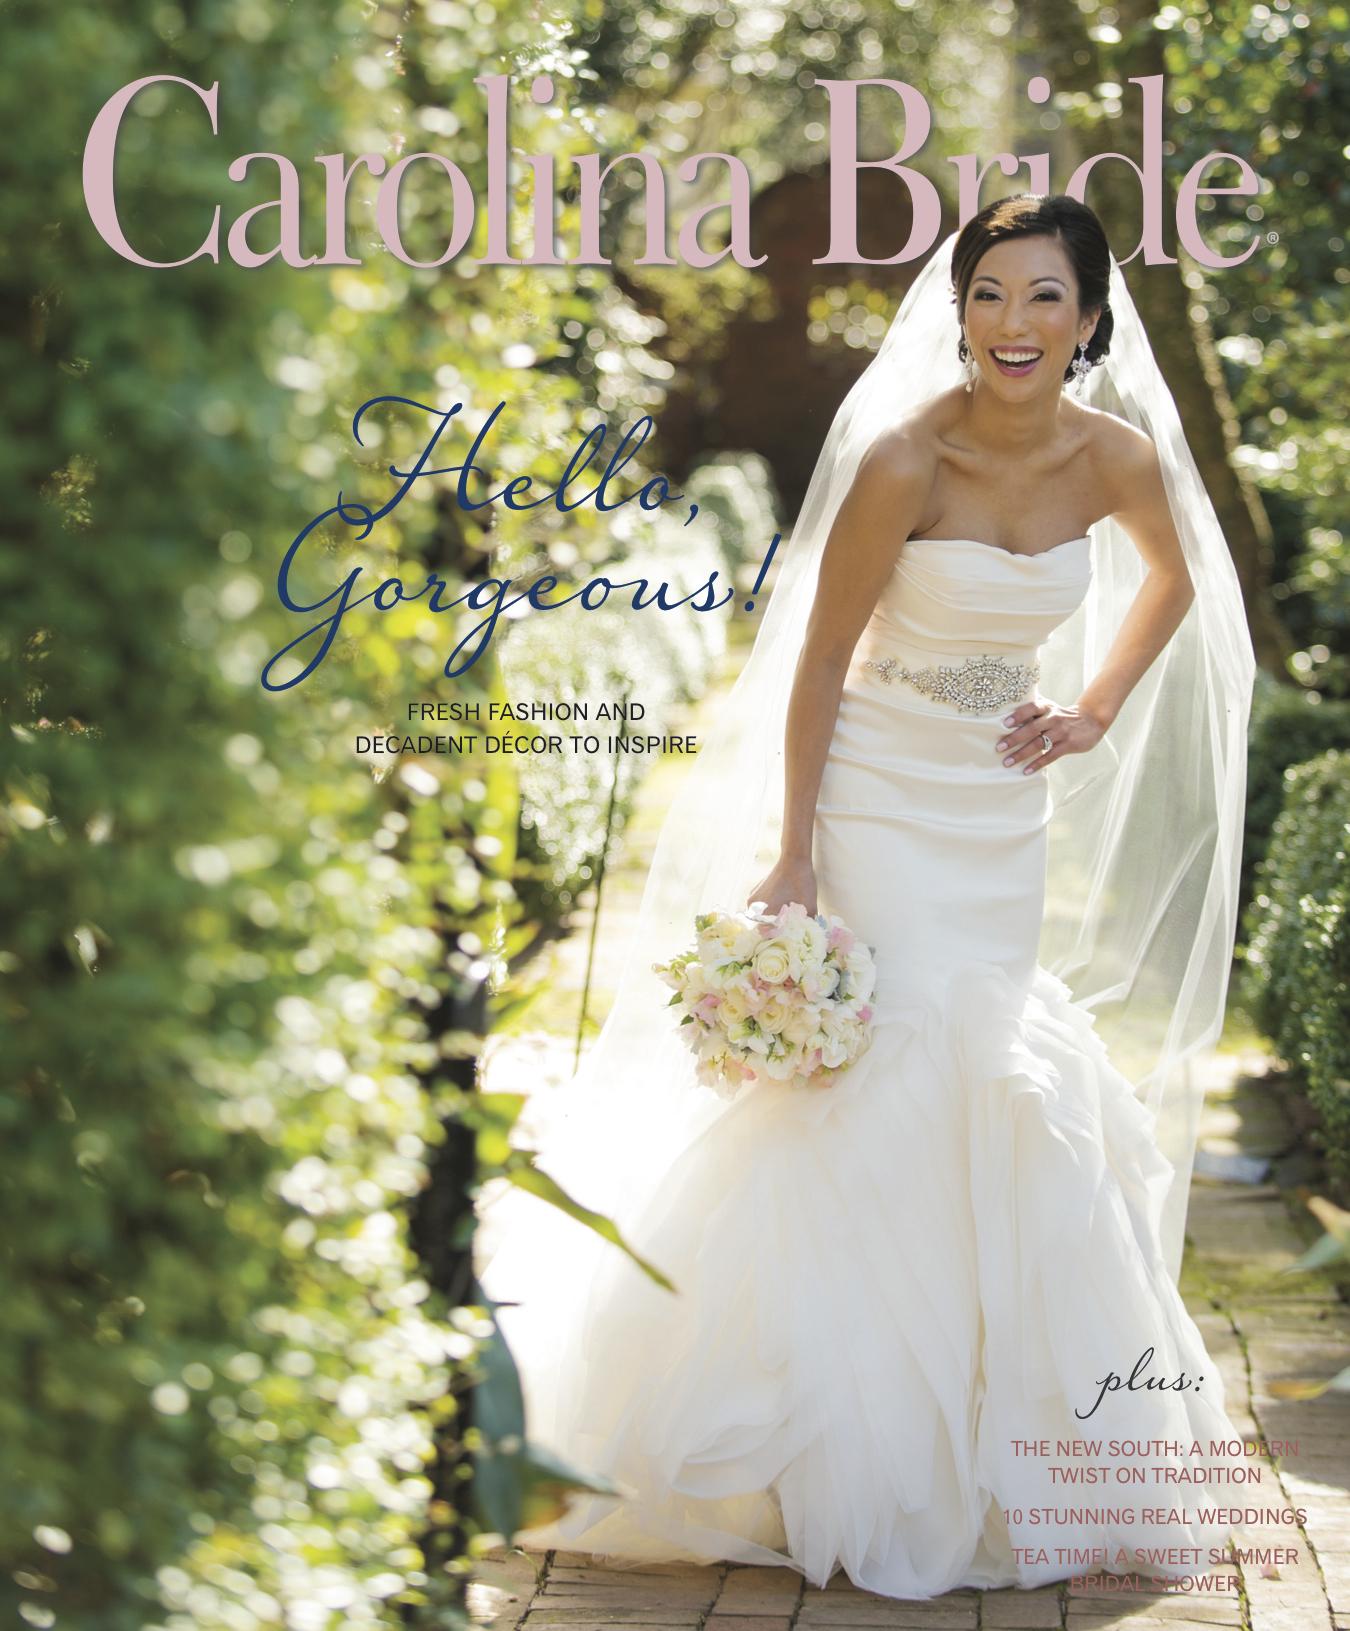 _C1.CBM COVER